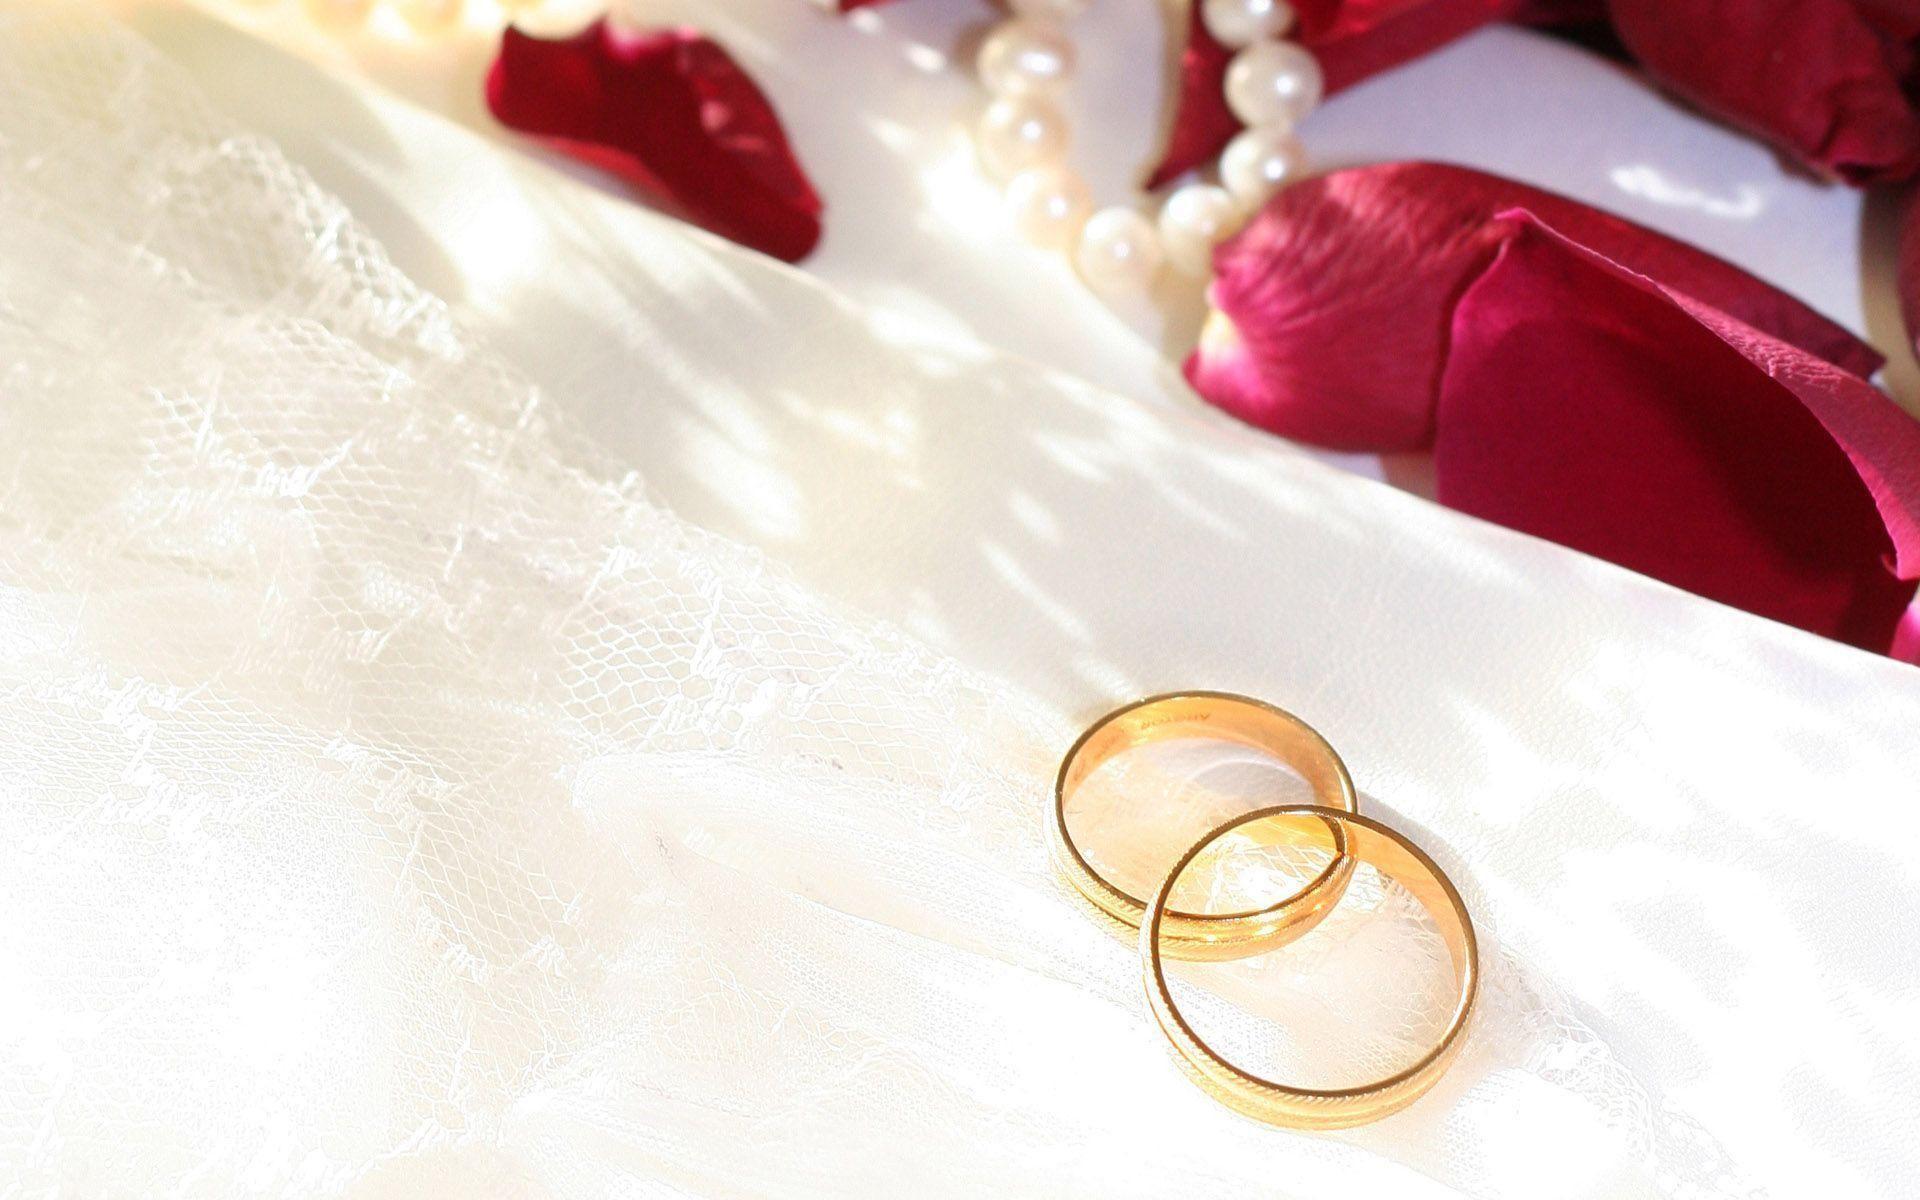 Hd Wedding Backgrounds Wallpaper Cave Wedding Background Wallpaper Wedding Ring Background Wedding Ring Wallpaper